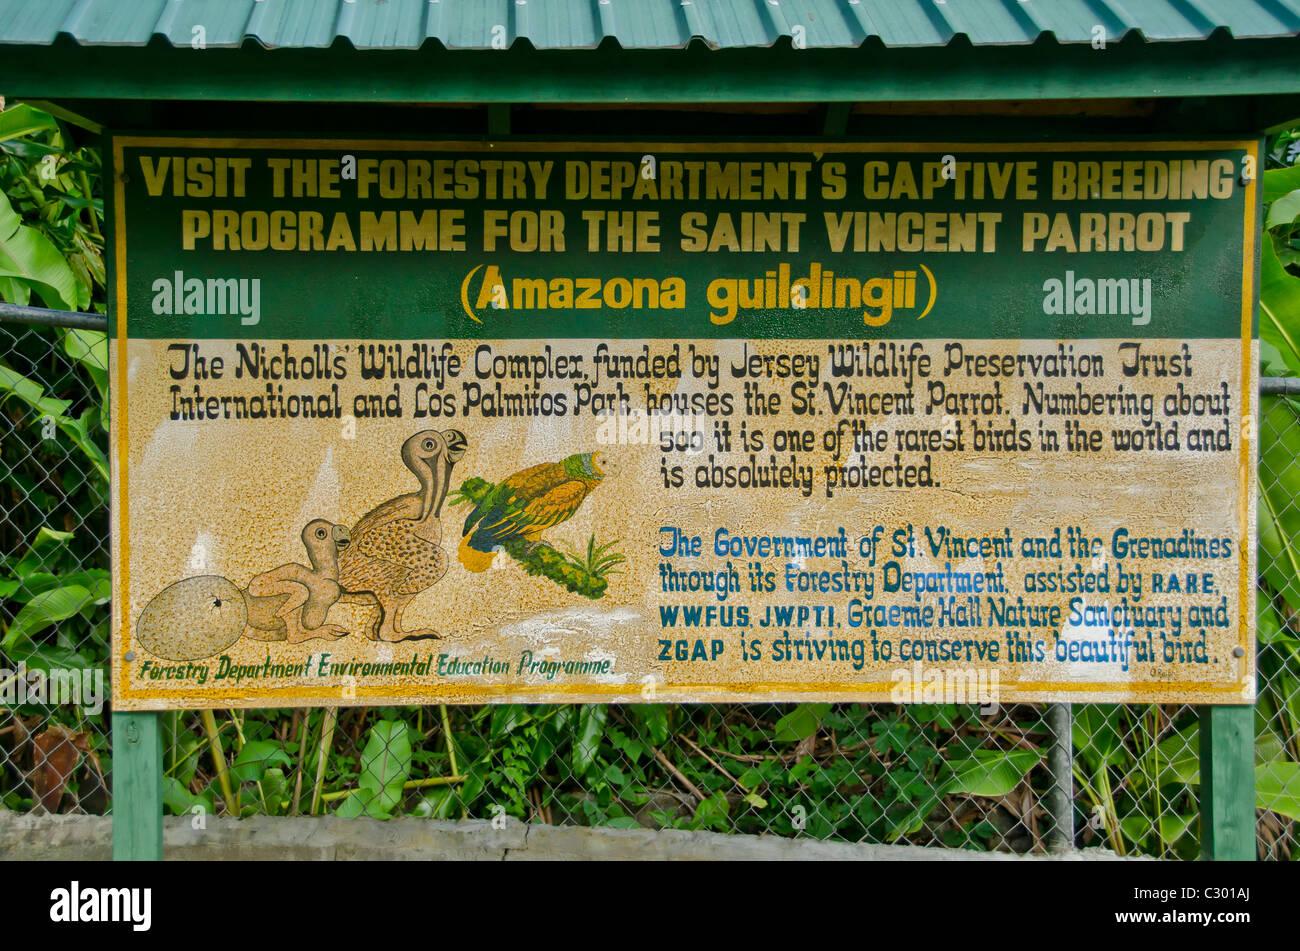 Botanical Gardens site of the parrot breeding effort at the Nicholls Wildlife Complex, Kingstown, Saint Vincent - Stock Image